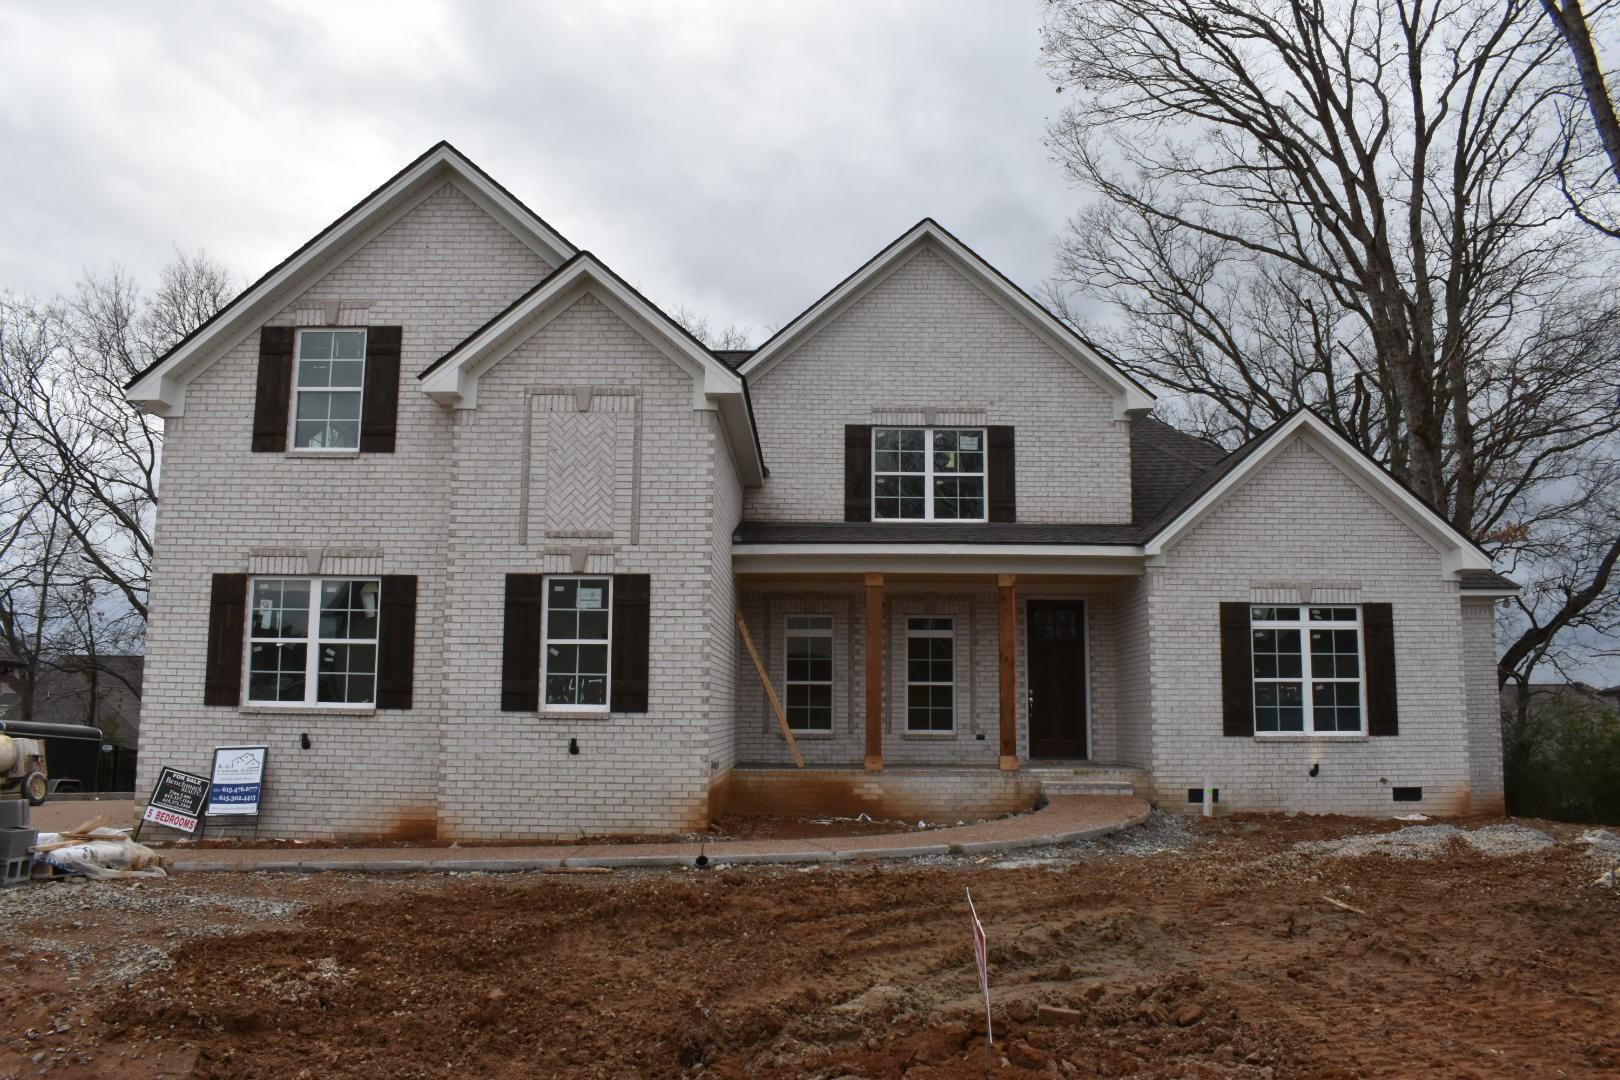 2961 Stewart Campbell Pt (247), Spring Hill, TN 37174 - Spring Hill, TN real estate listing